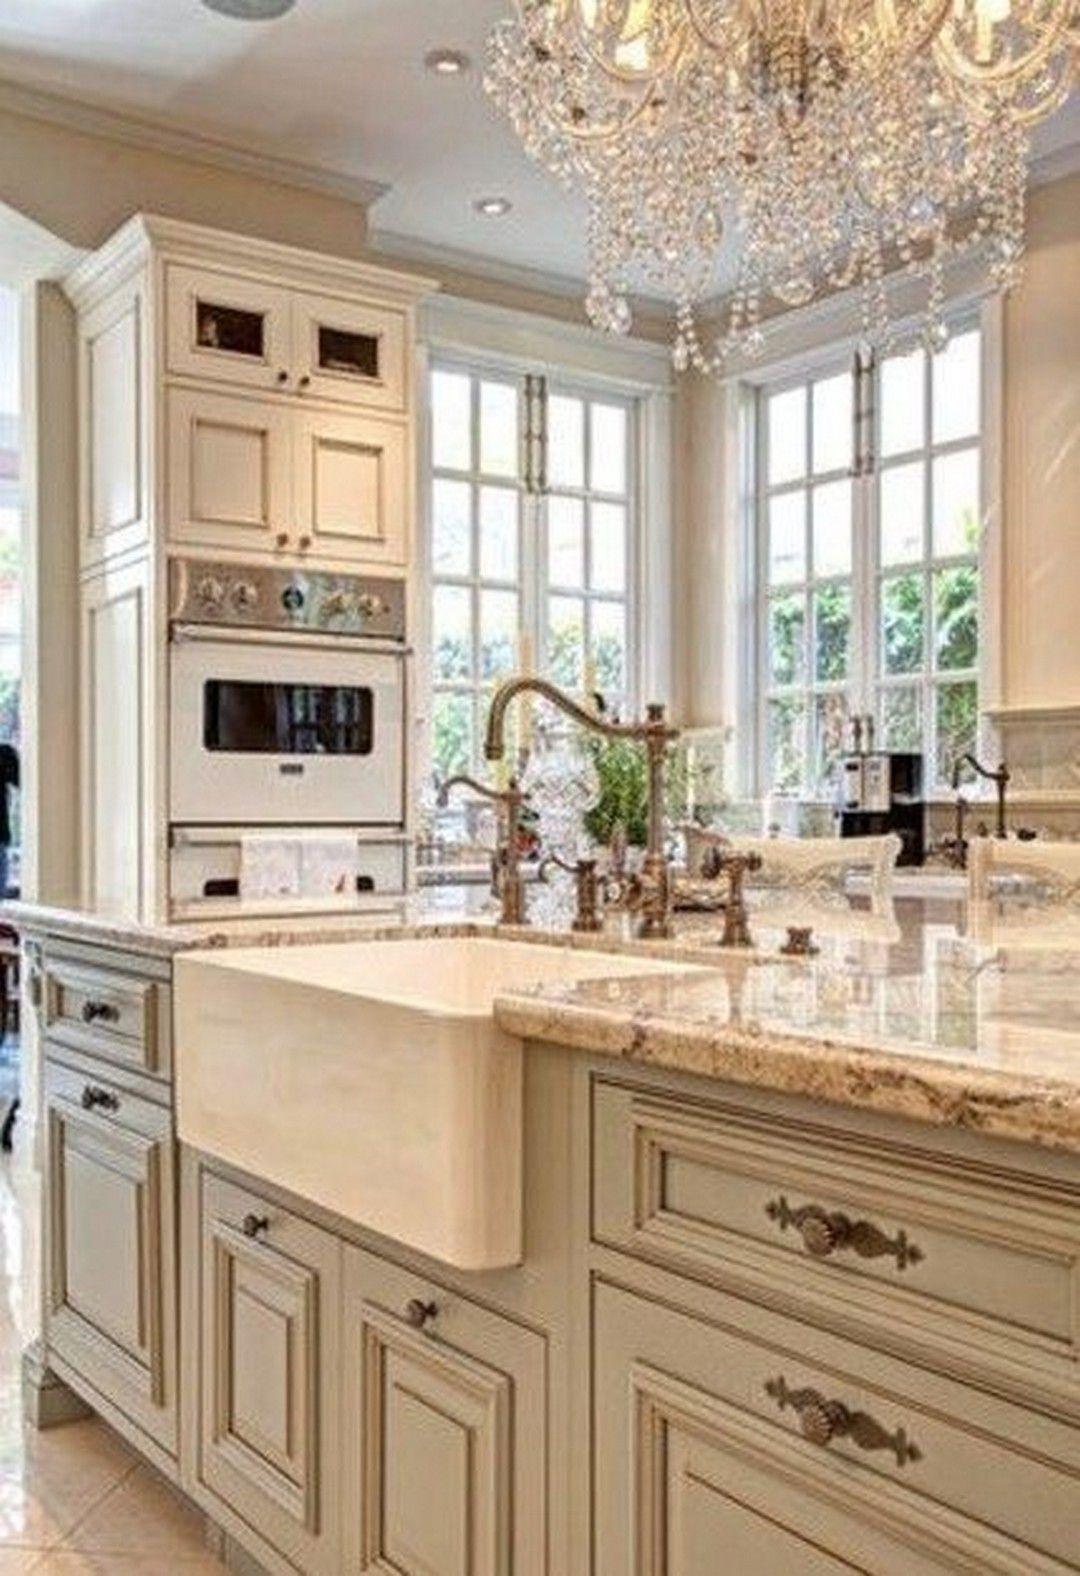 Luxury And Elegant Kitchen Design Inspiration Country Kitchen